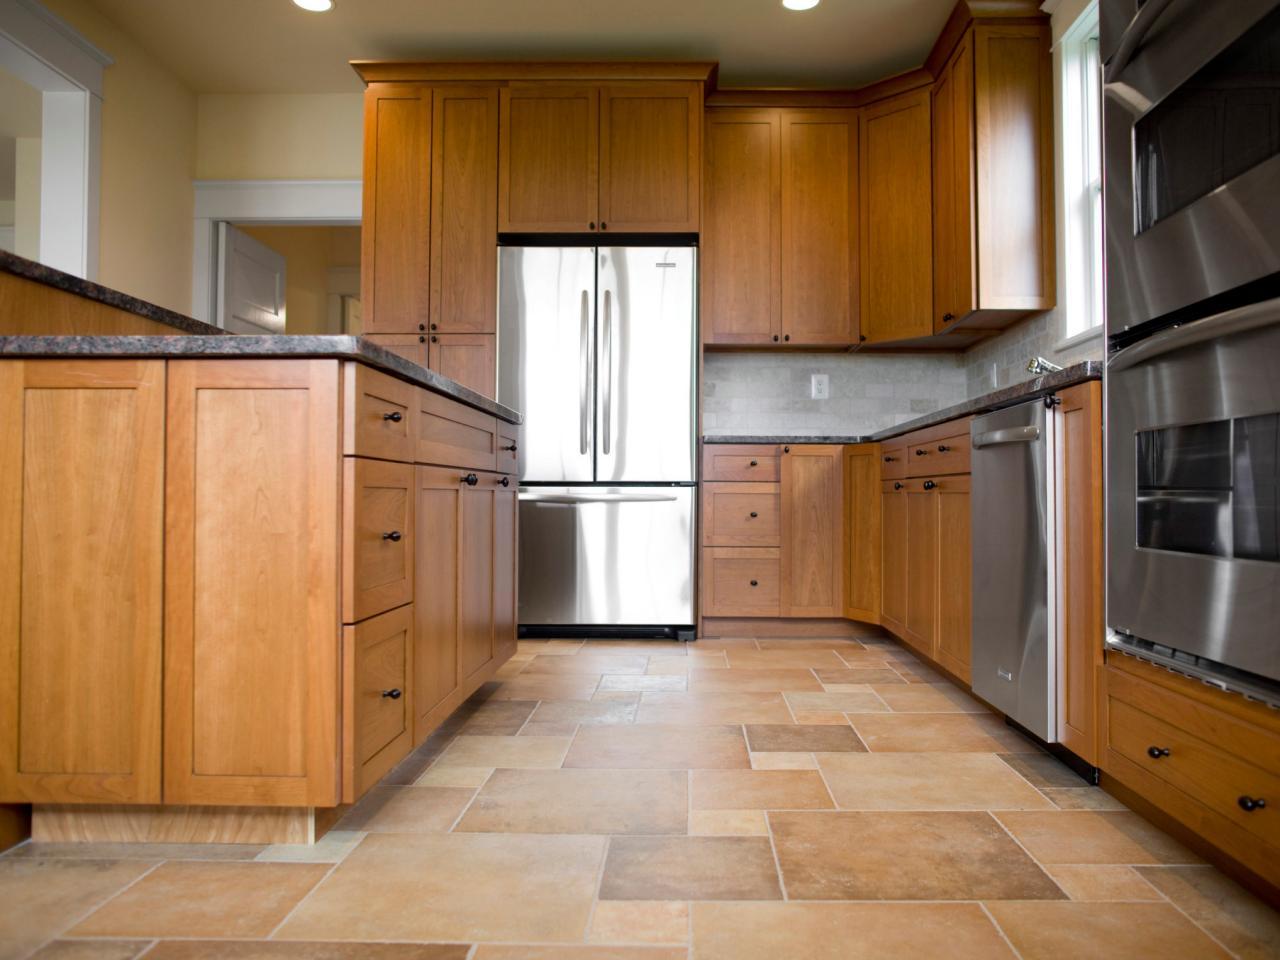 best floor tile ideas whatu0027s the best kitchen floor tile? FEXAYIW